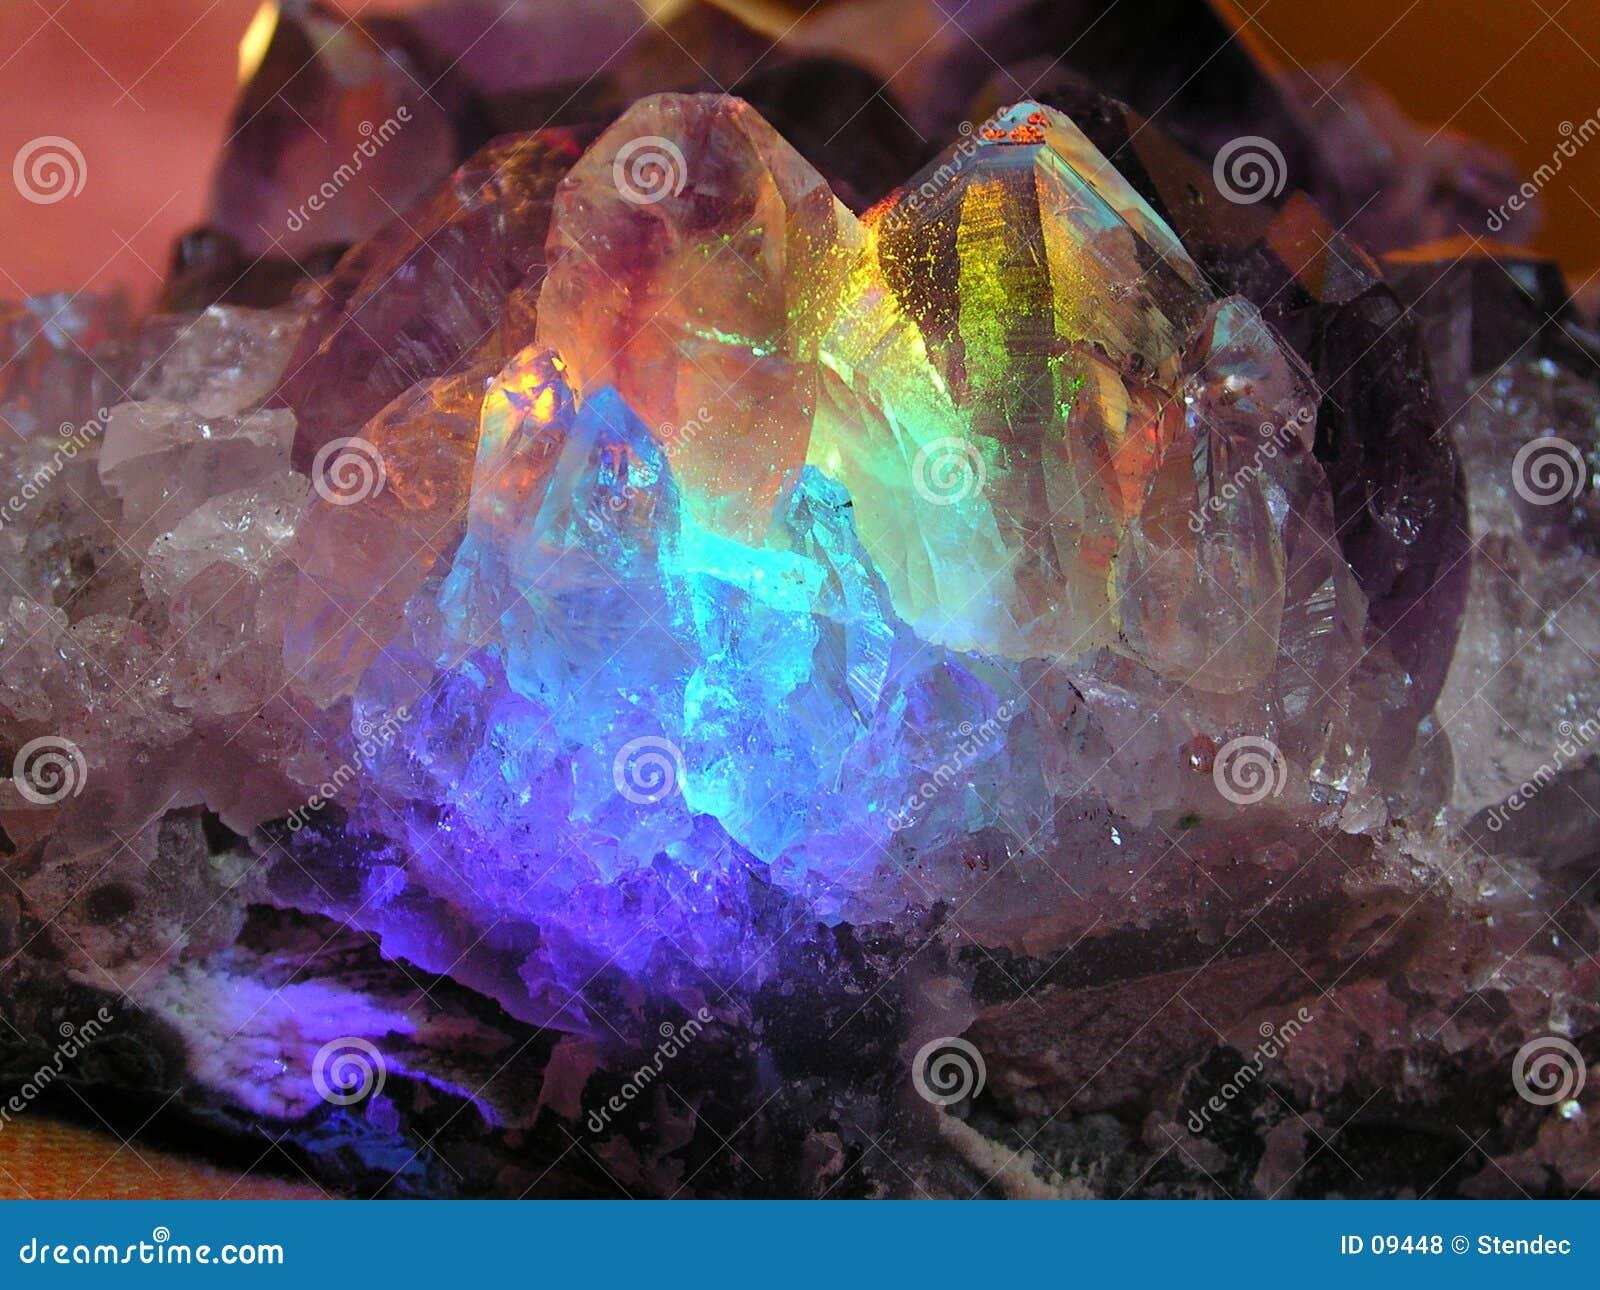 Magical kristall